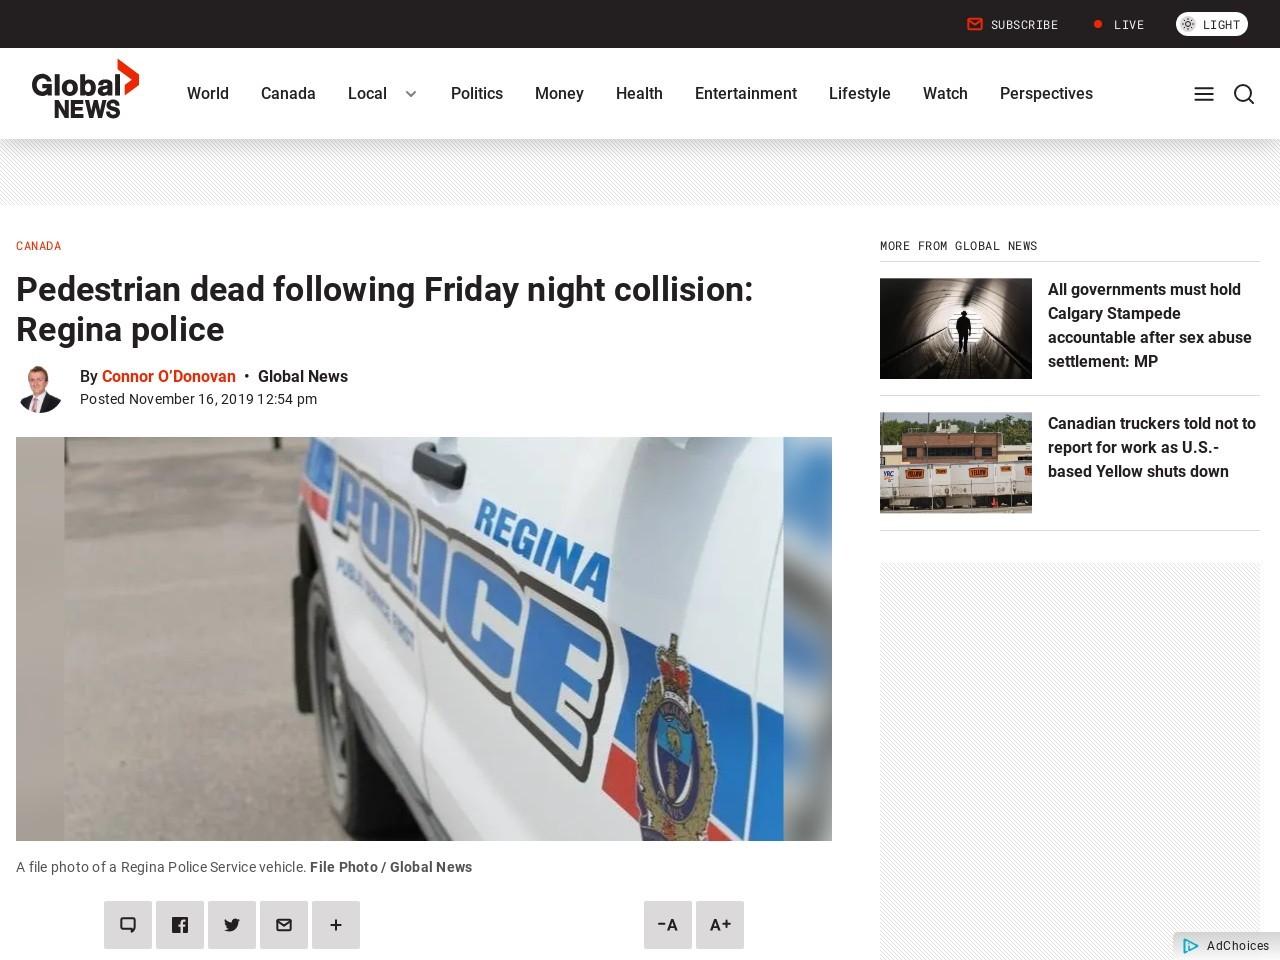 Pedestrian dead following Friday night collision: Regina police